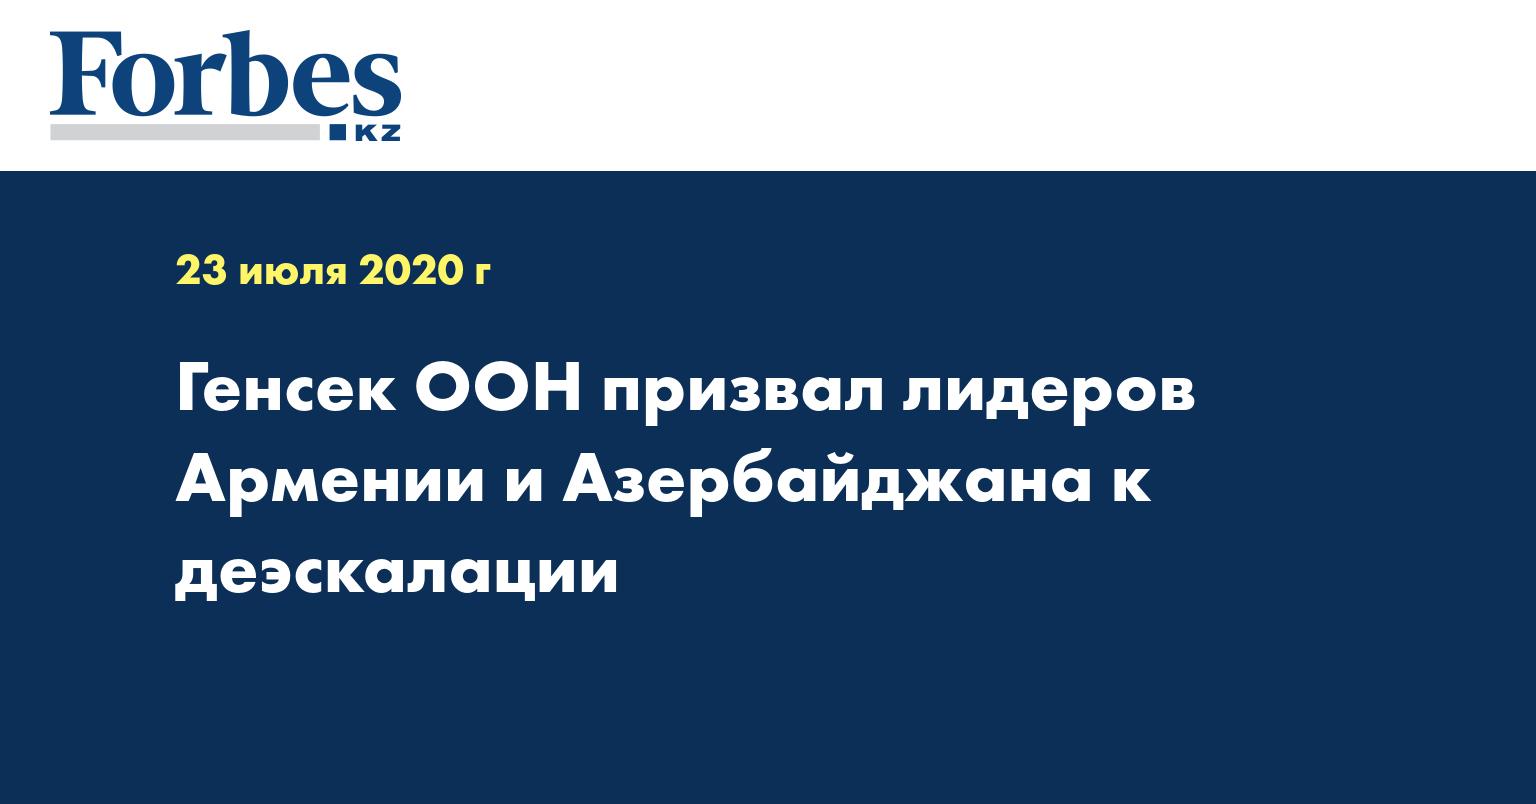 Генсек ООН призвал лидеров Армении и Азербайджана к деэскалации